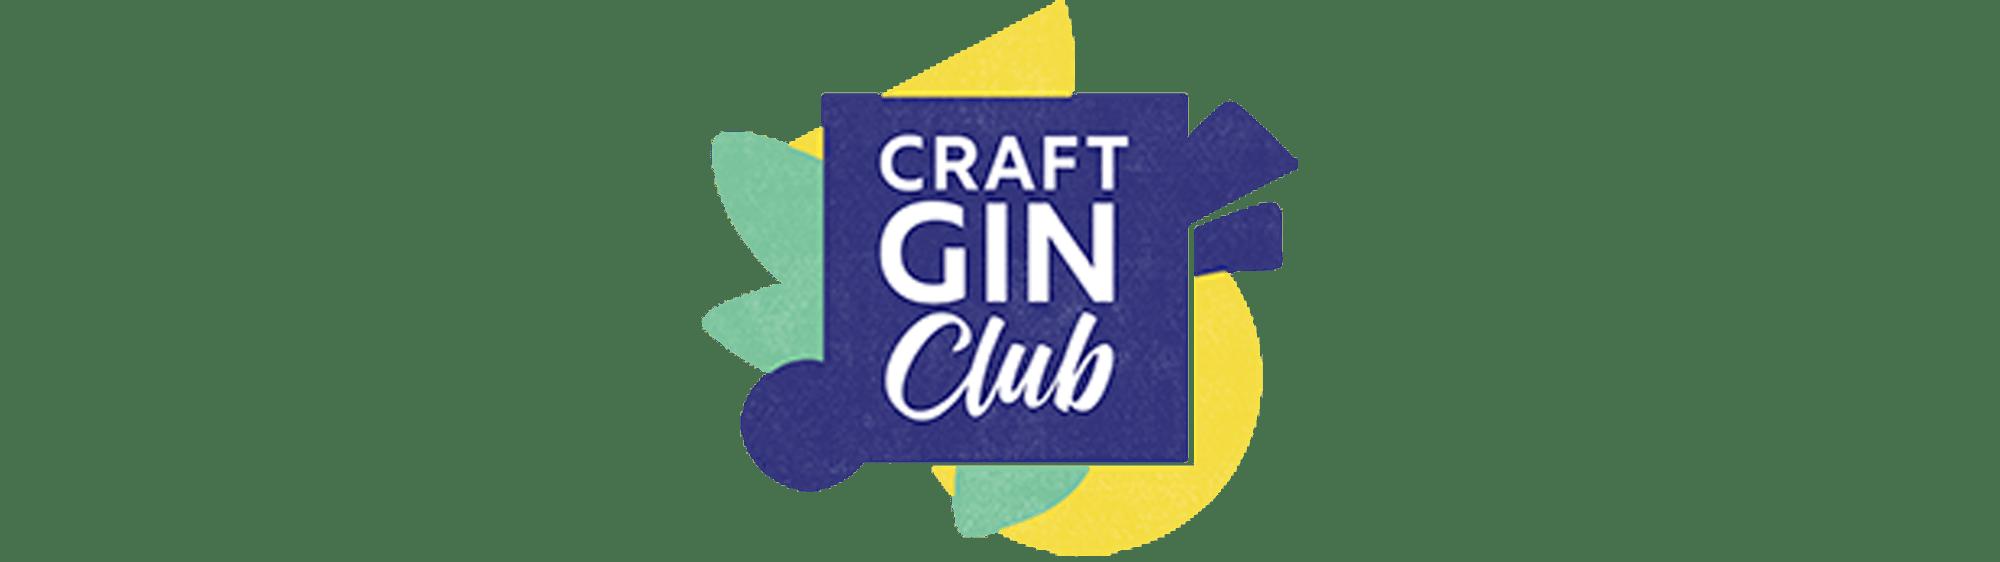 Craft Gin Club Wide